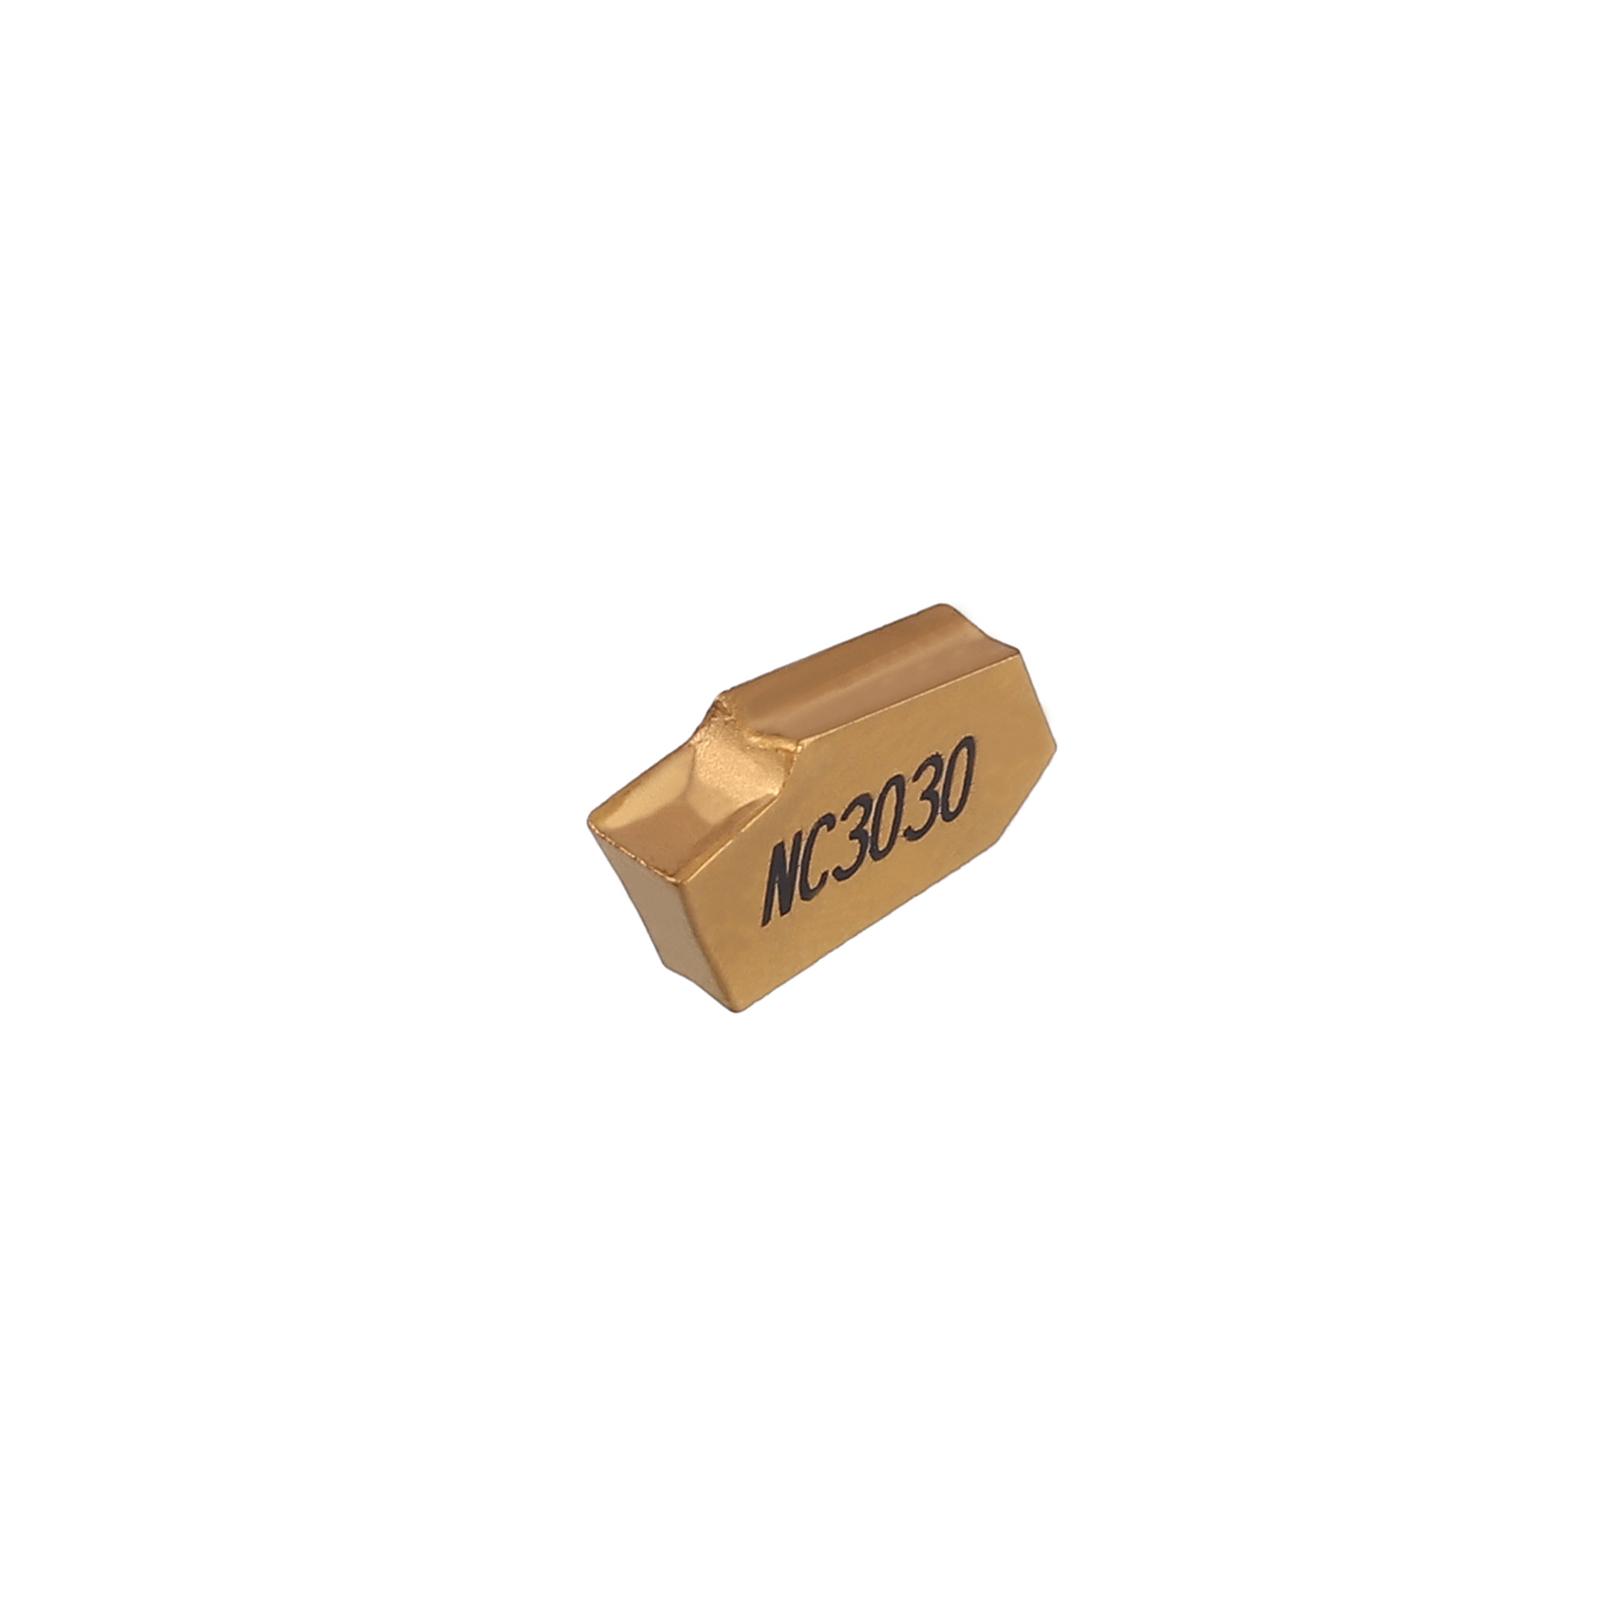 SPB26-3 Drehwerkzeug Wendeschneidplatten+10 GTN-3 SP300 Hartmetalleinsatz Stahl